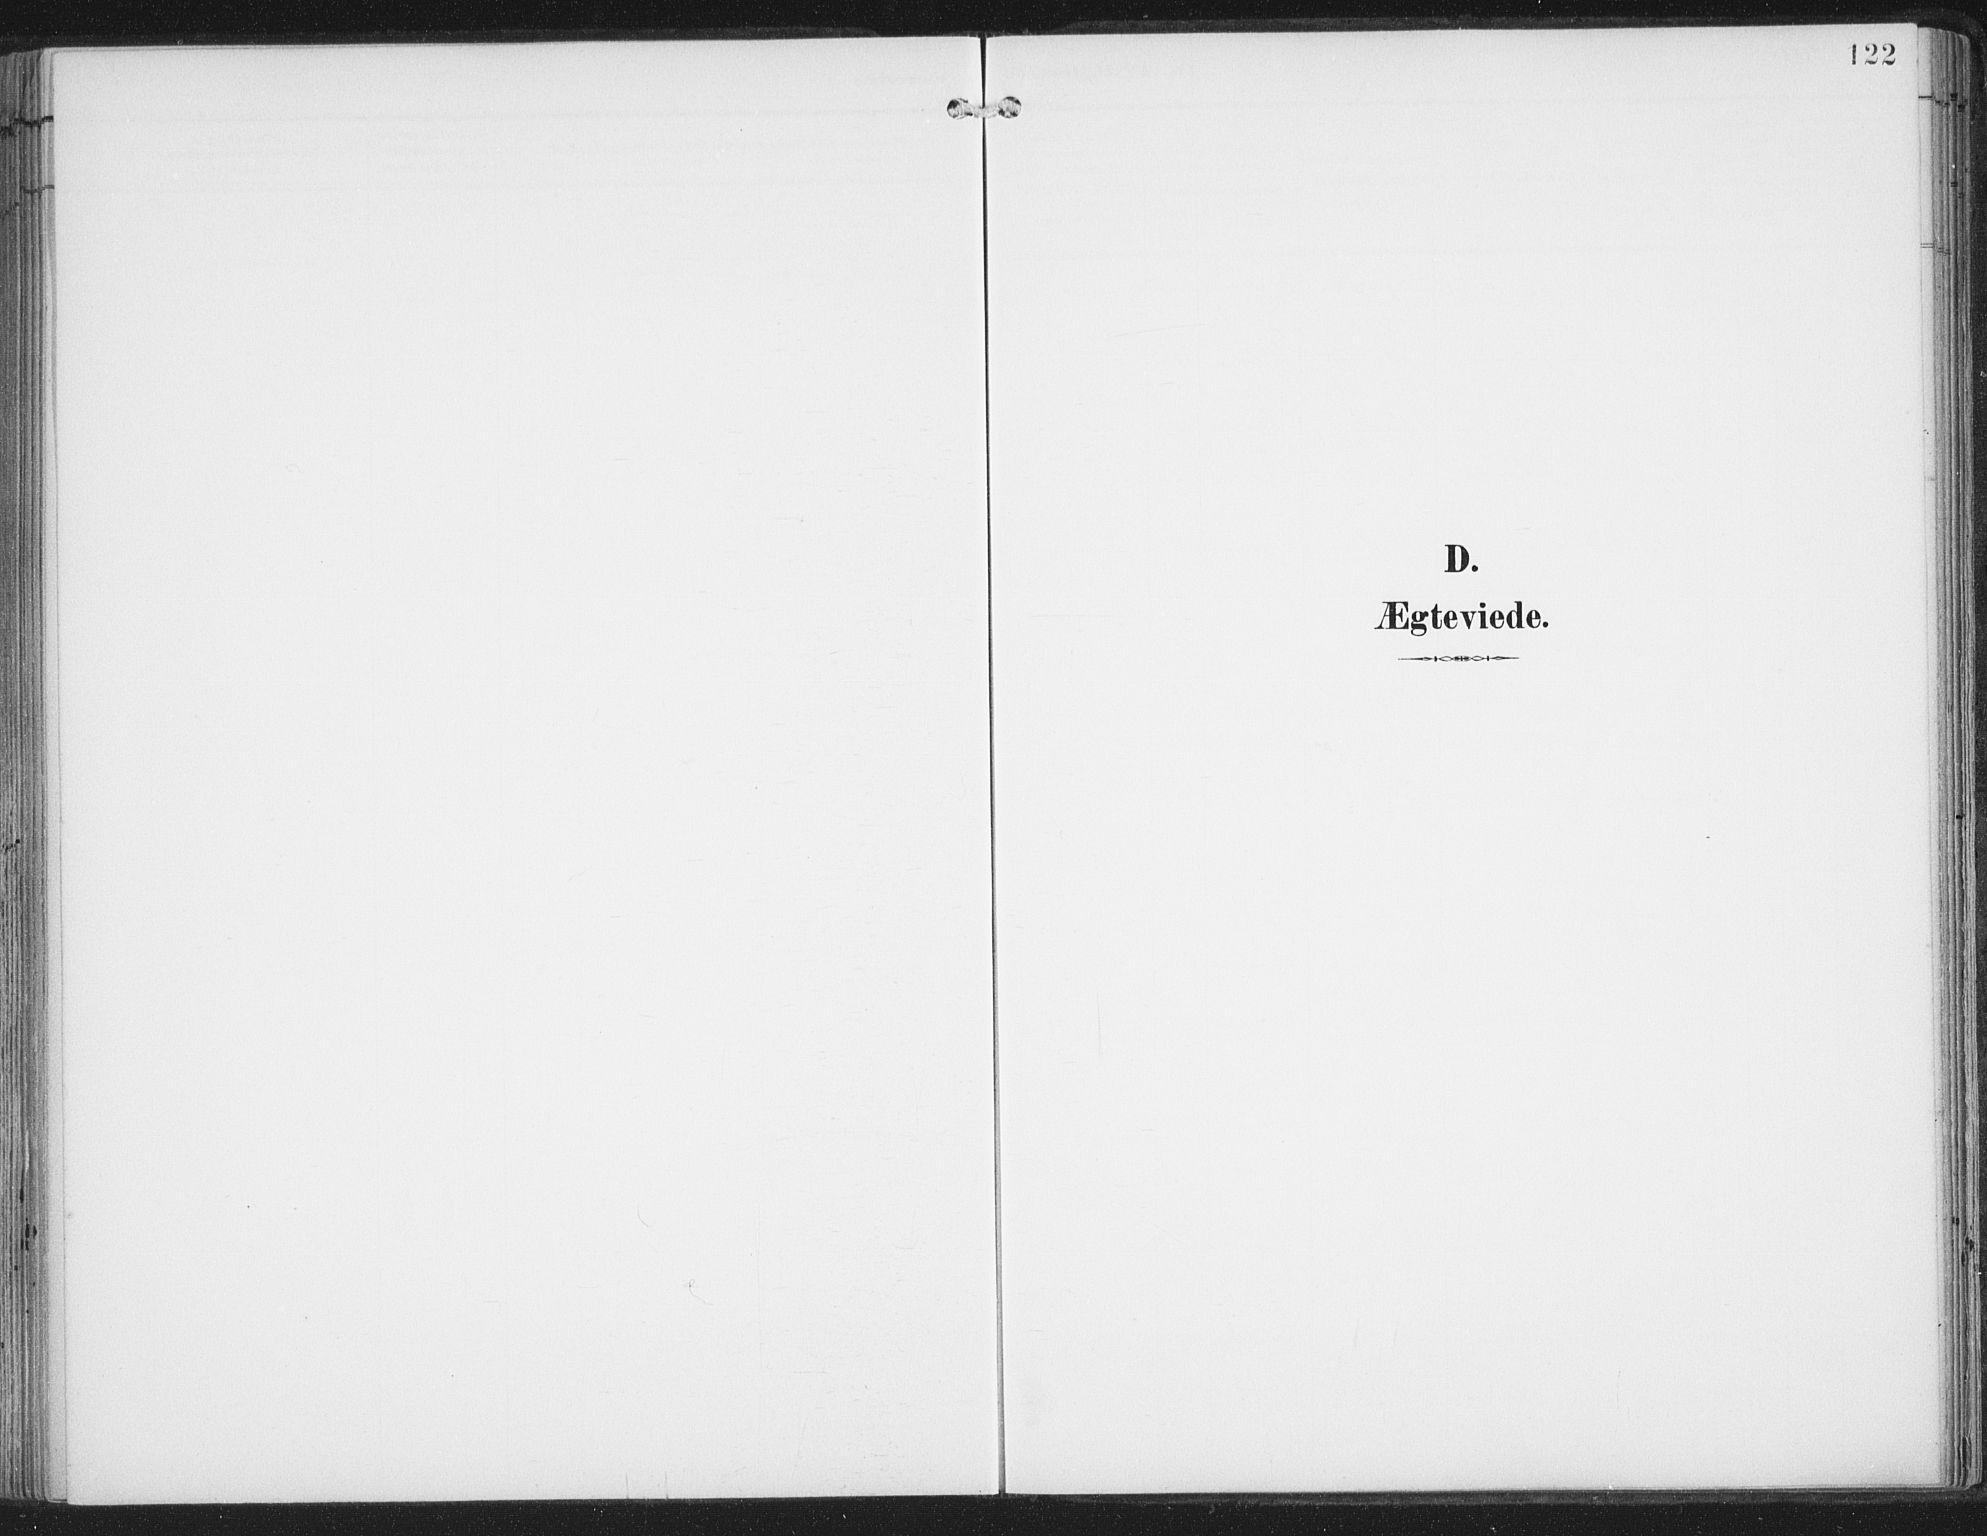 SATØ, Lenvik sokneprestembete, H/Ha: Ministerialbok nr. 15, 1896-1915, s. 122